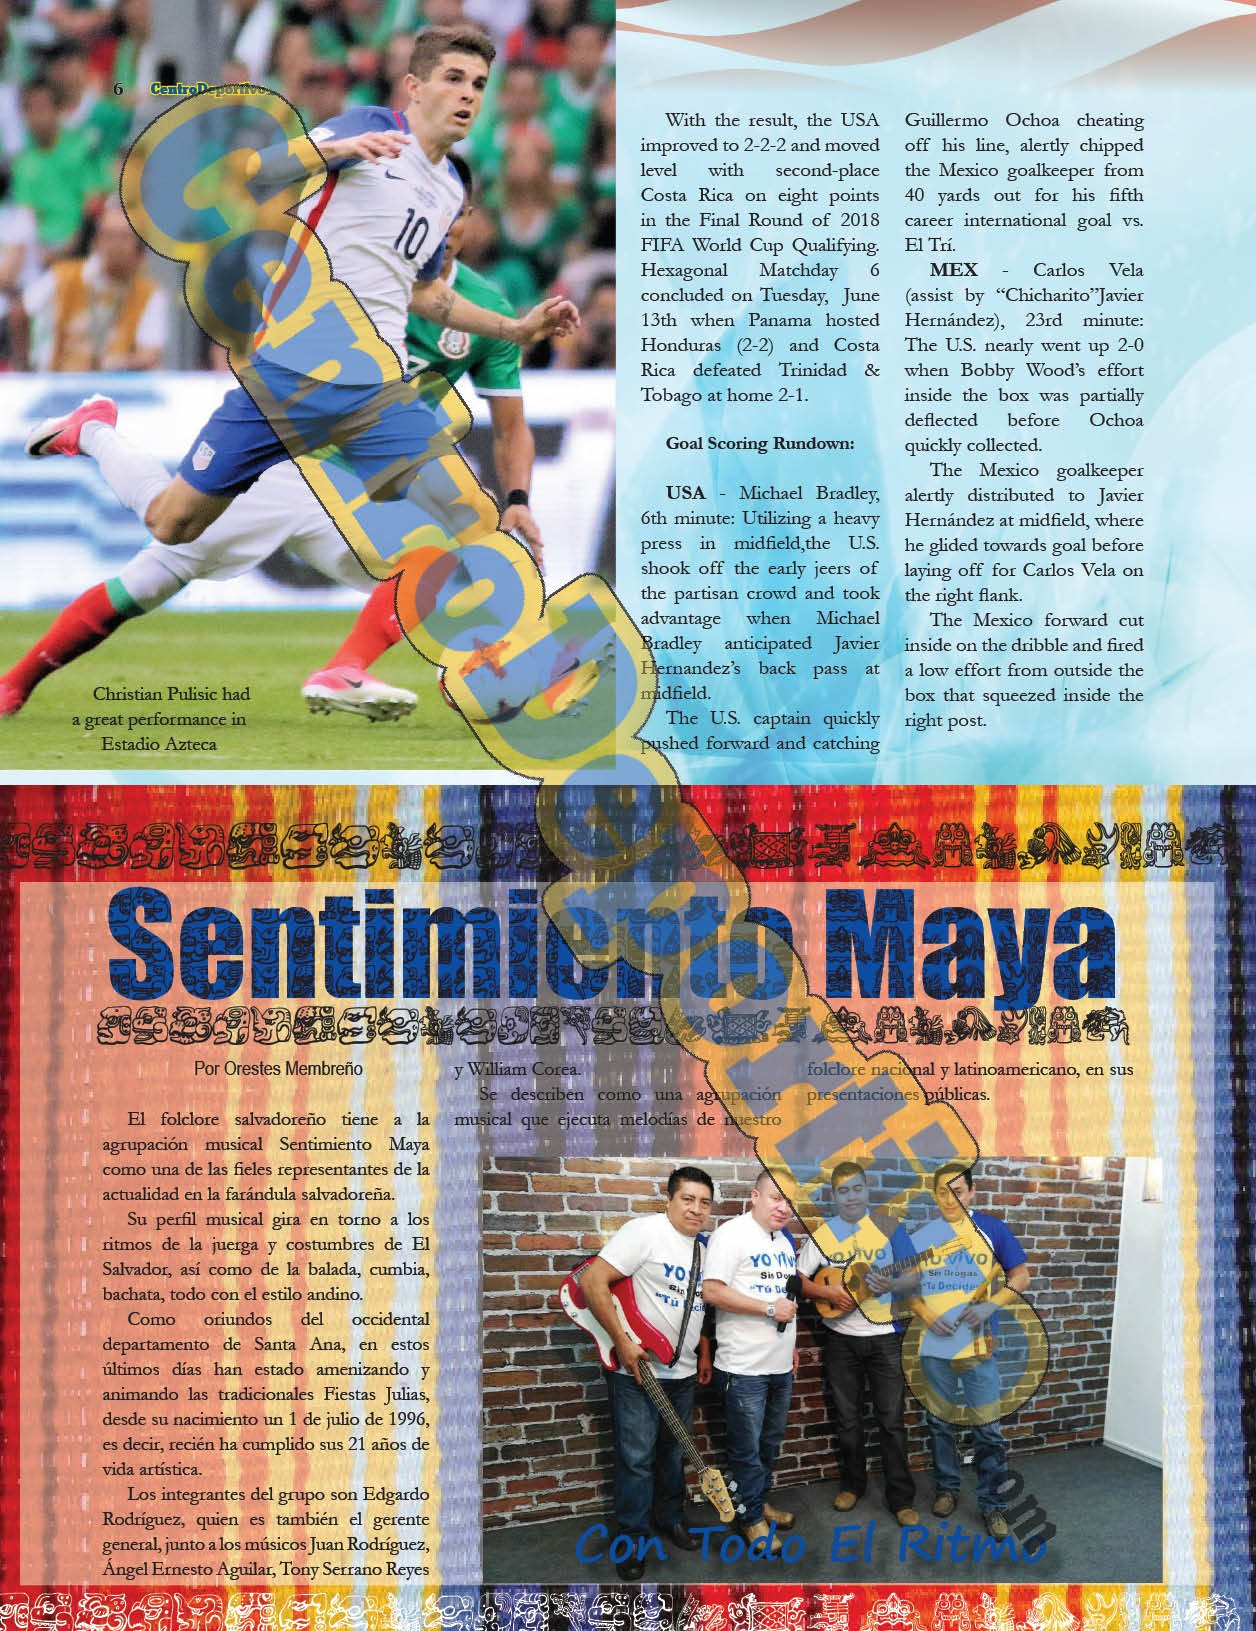 CentroDeportivo Magazine, Summer 2017: CentroDeportivo, Jorge O. Martinez, Tomas Romero, Pedro Sorto, Frank Chavez, Jorge O. Martinez Roberto Burgos, ...